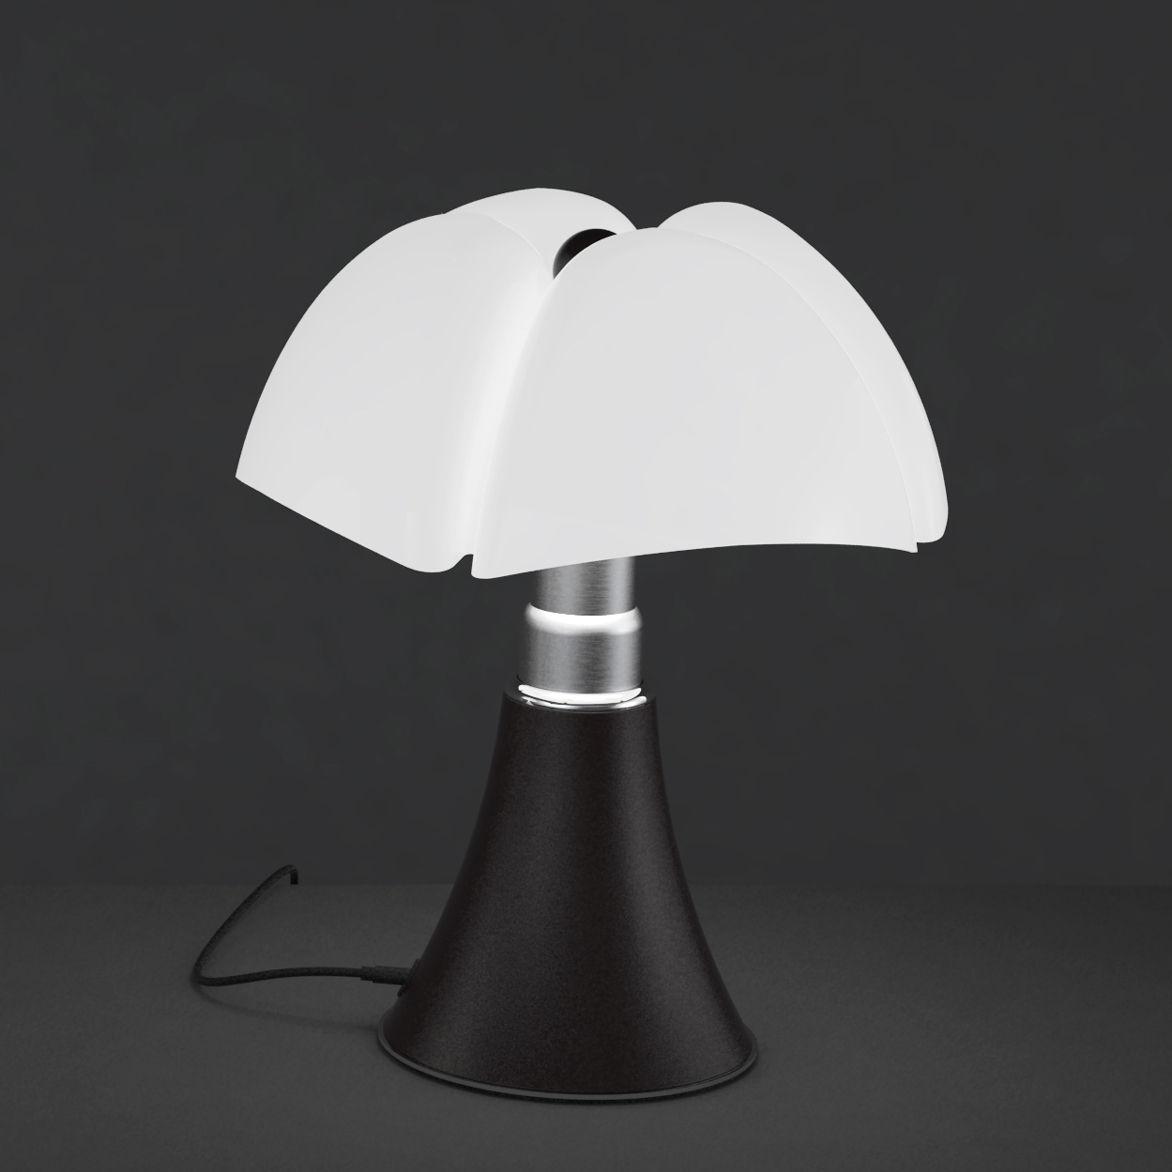 Lampada senza fili minipipistrello led martinelli luce - Lampada da tavolo senza fili ...